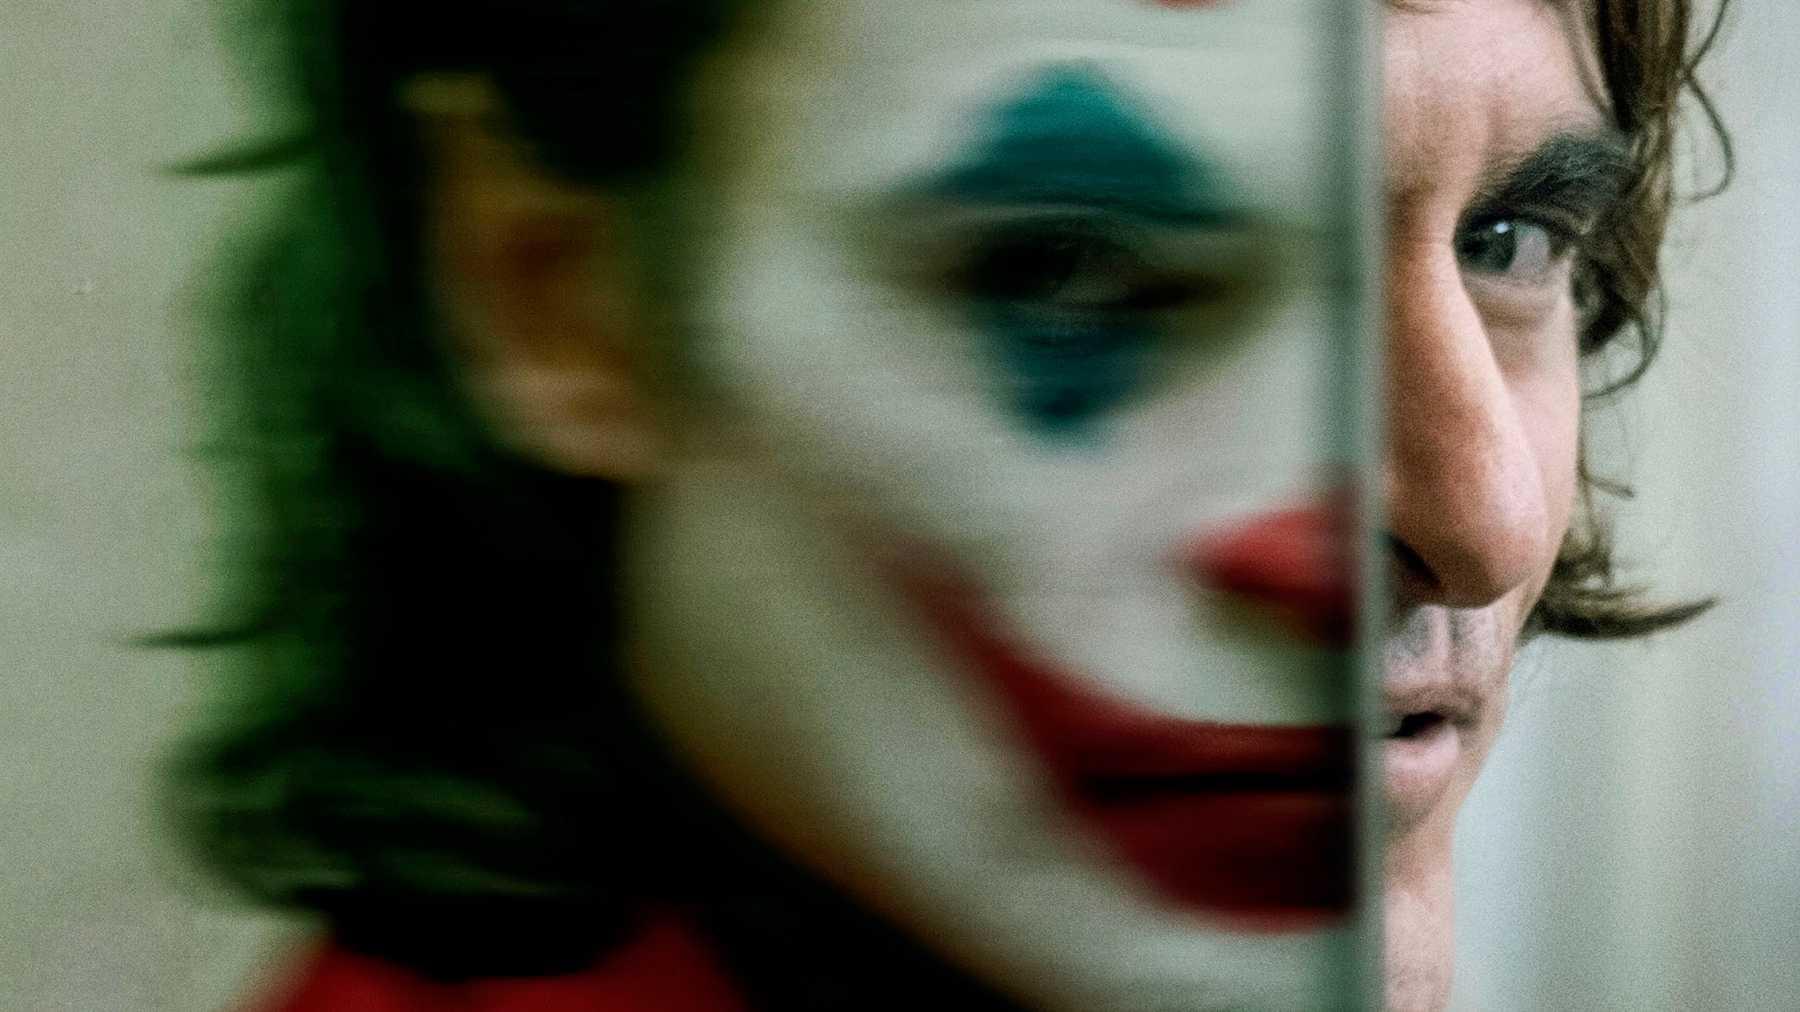 joker-movie-2019-joaquin phoenix